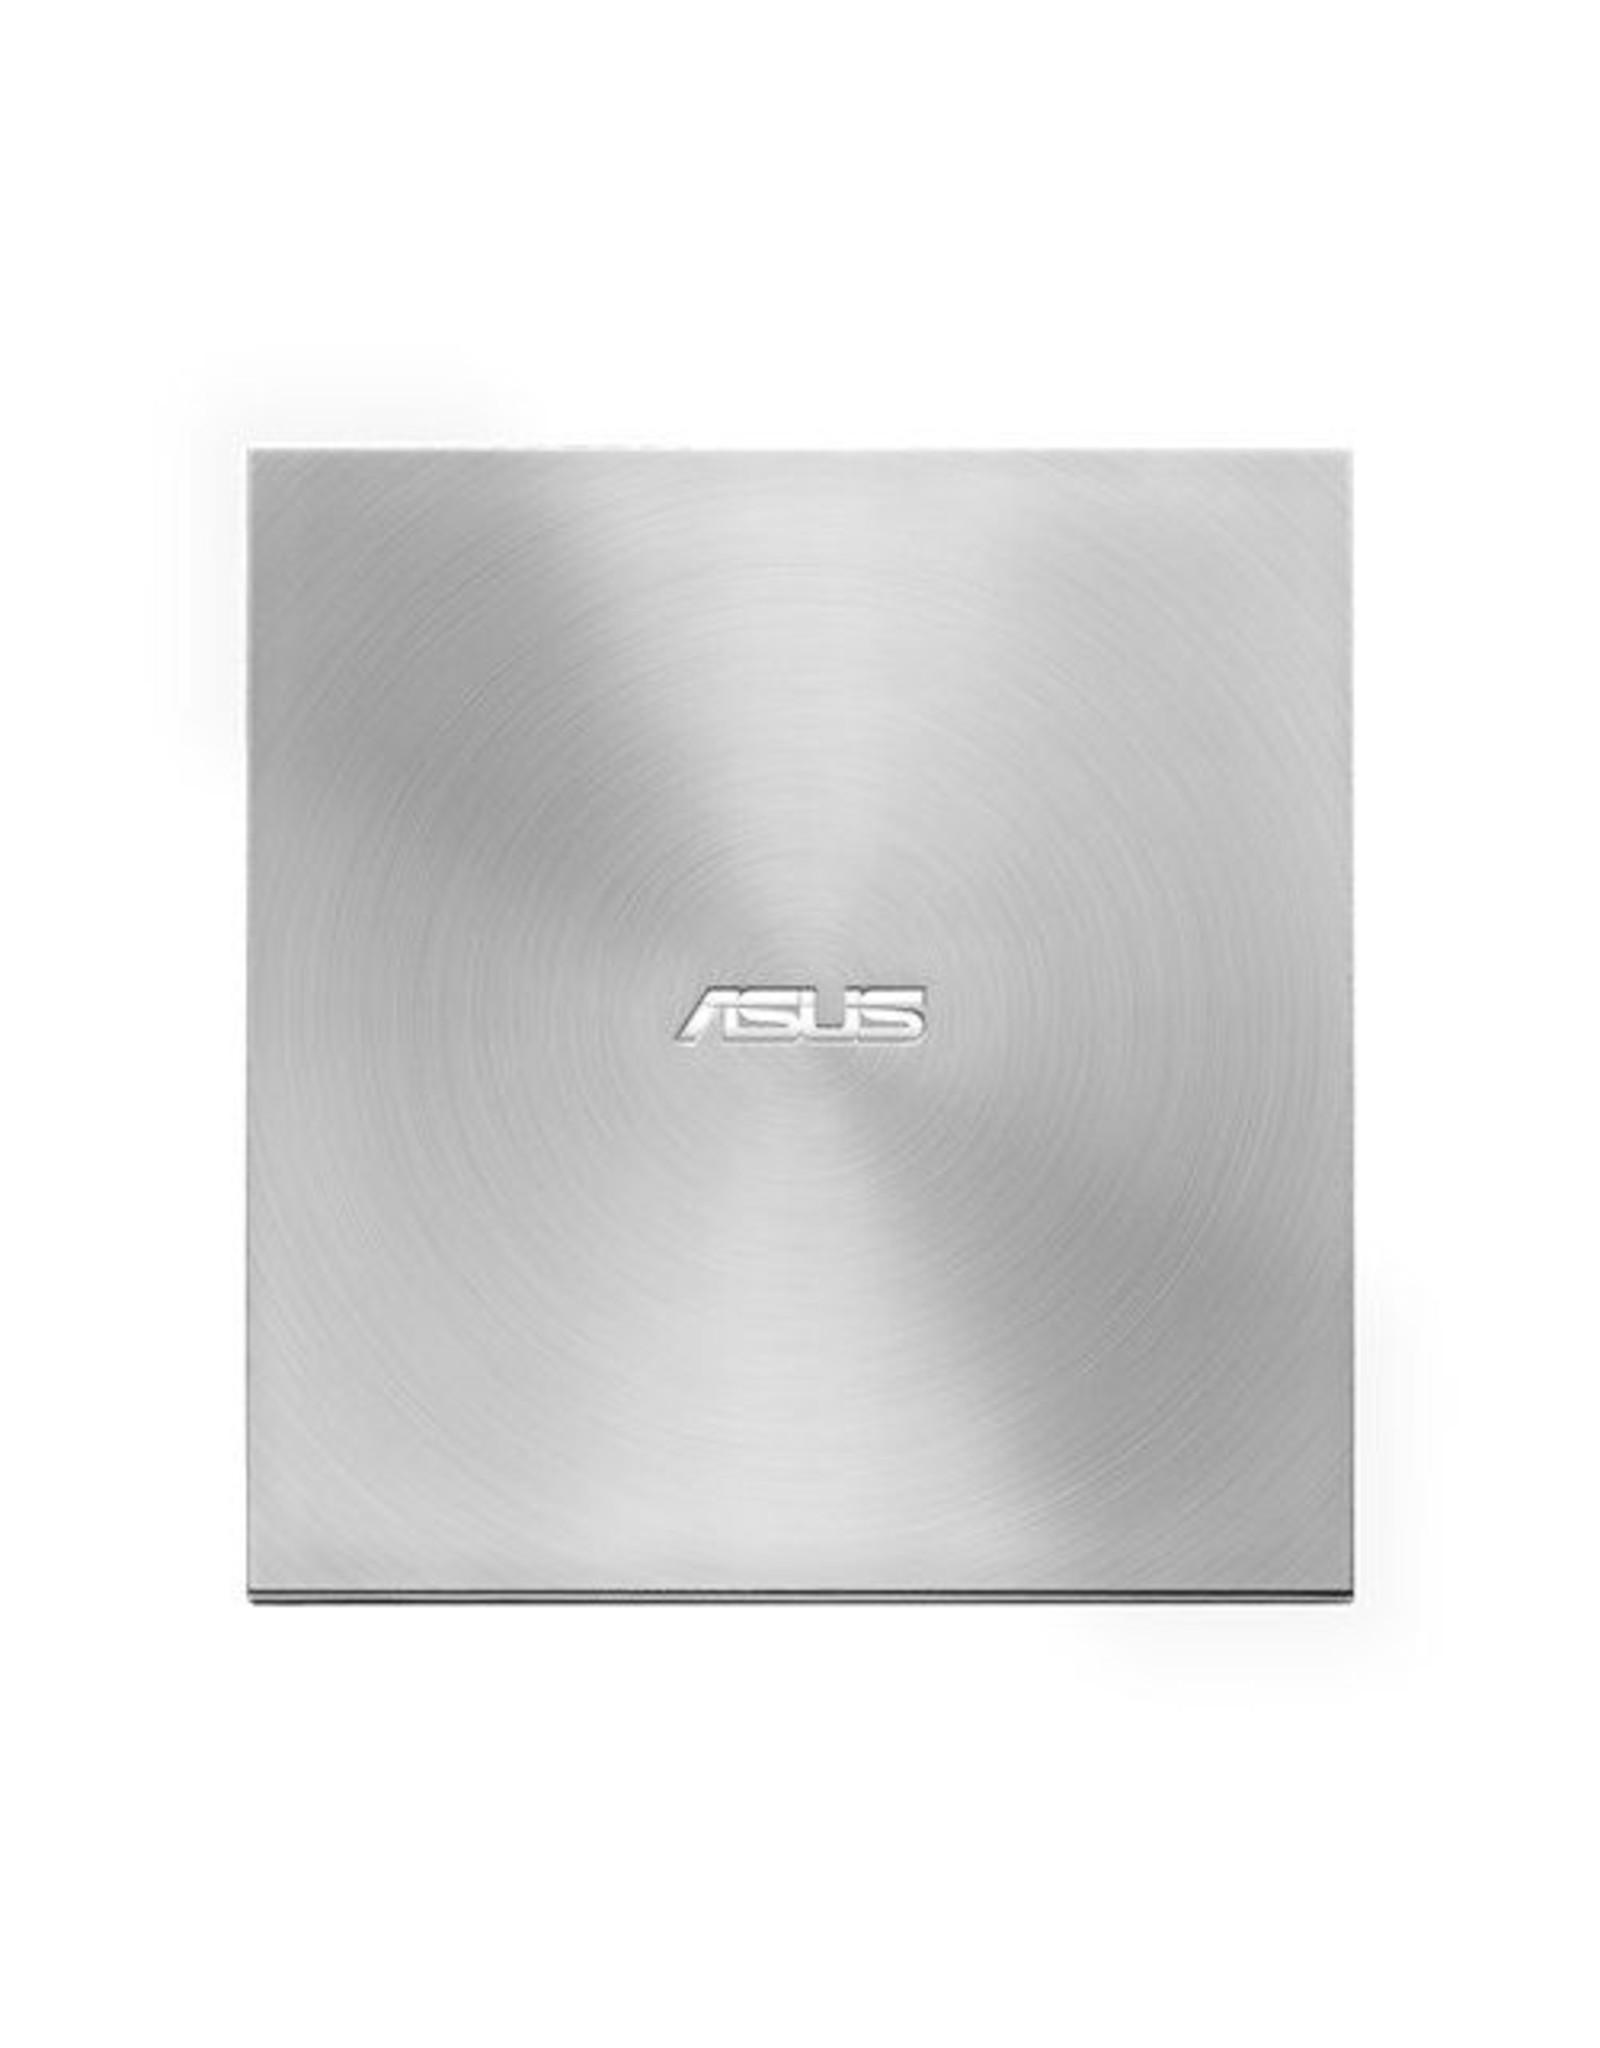 ASUS Asus Sdrw-08U7m-u 90DD01X2-m29000